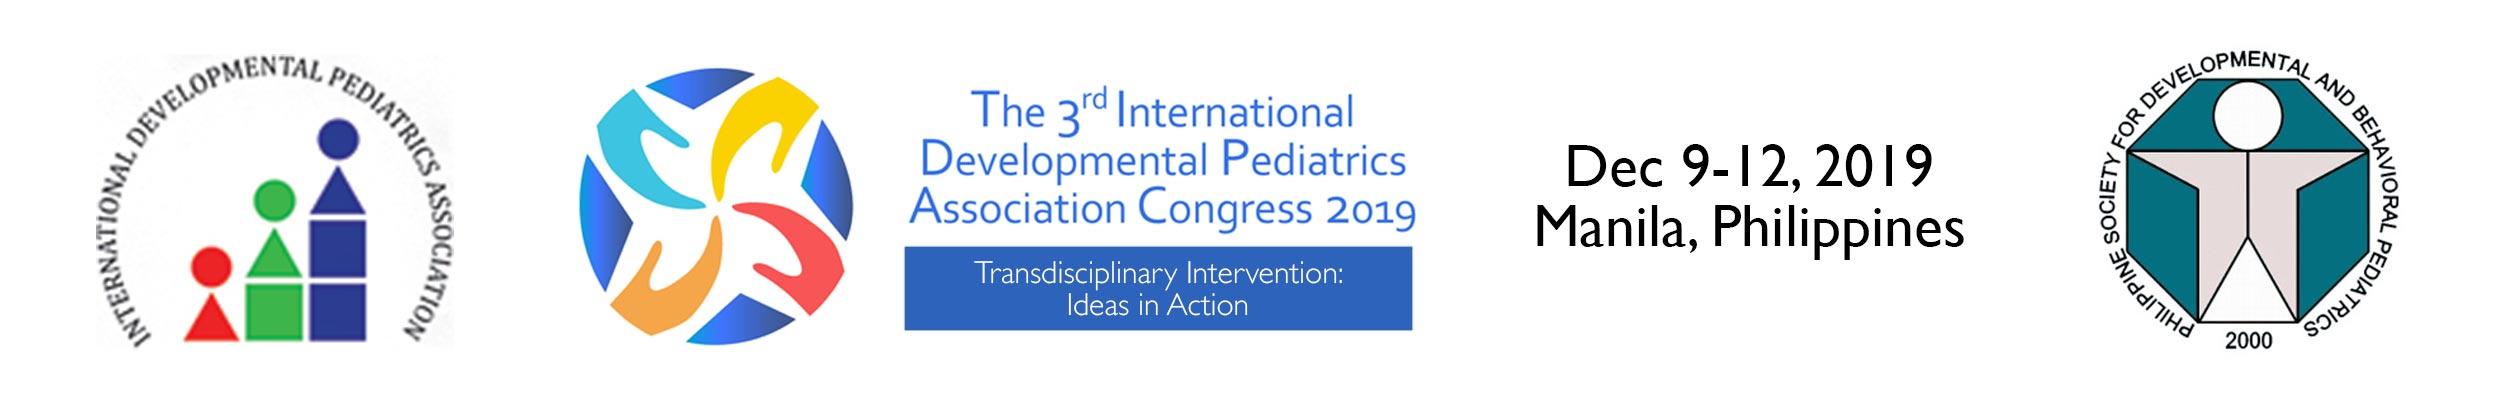 International Developmental Pediatrics Association Congress